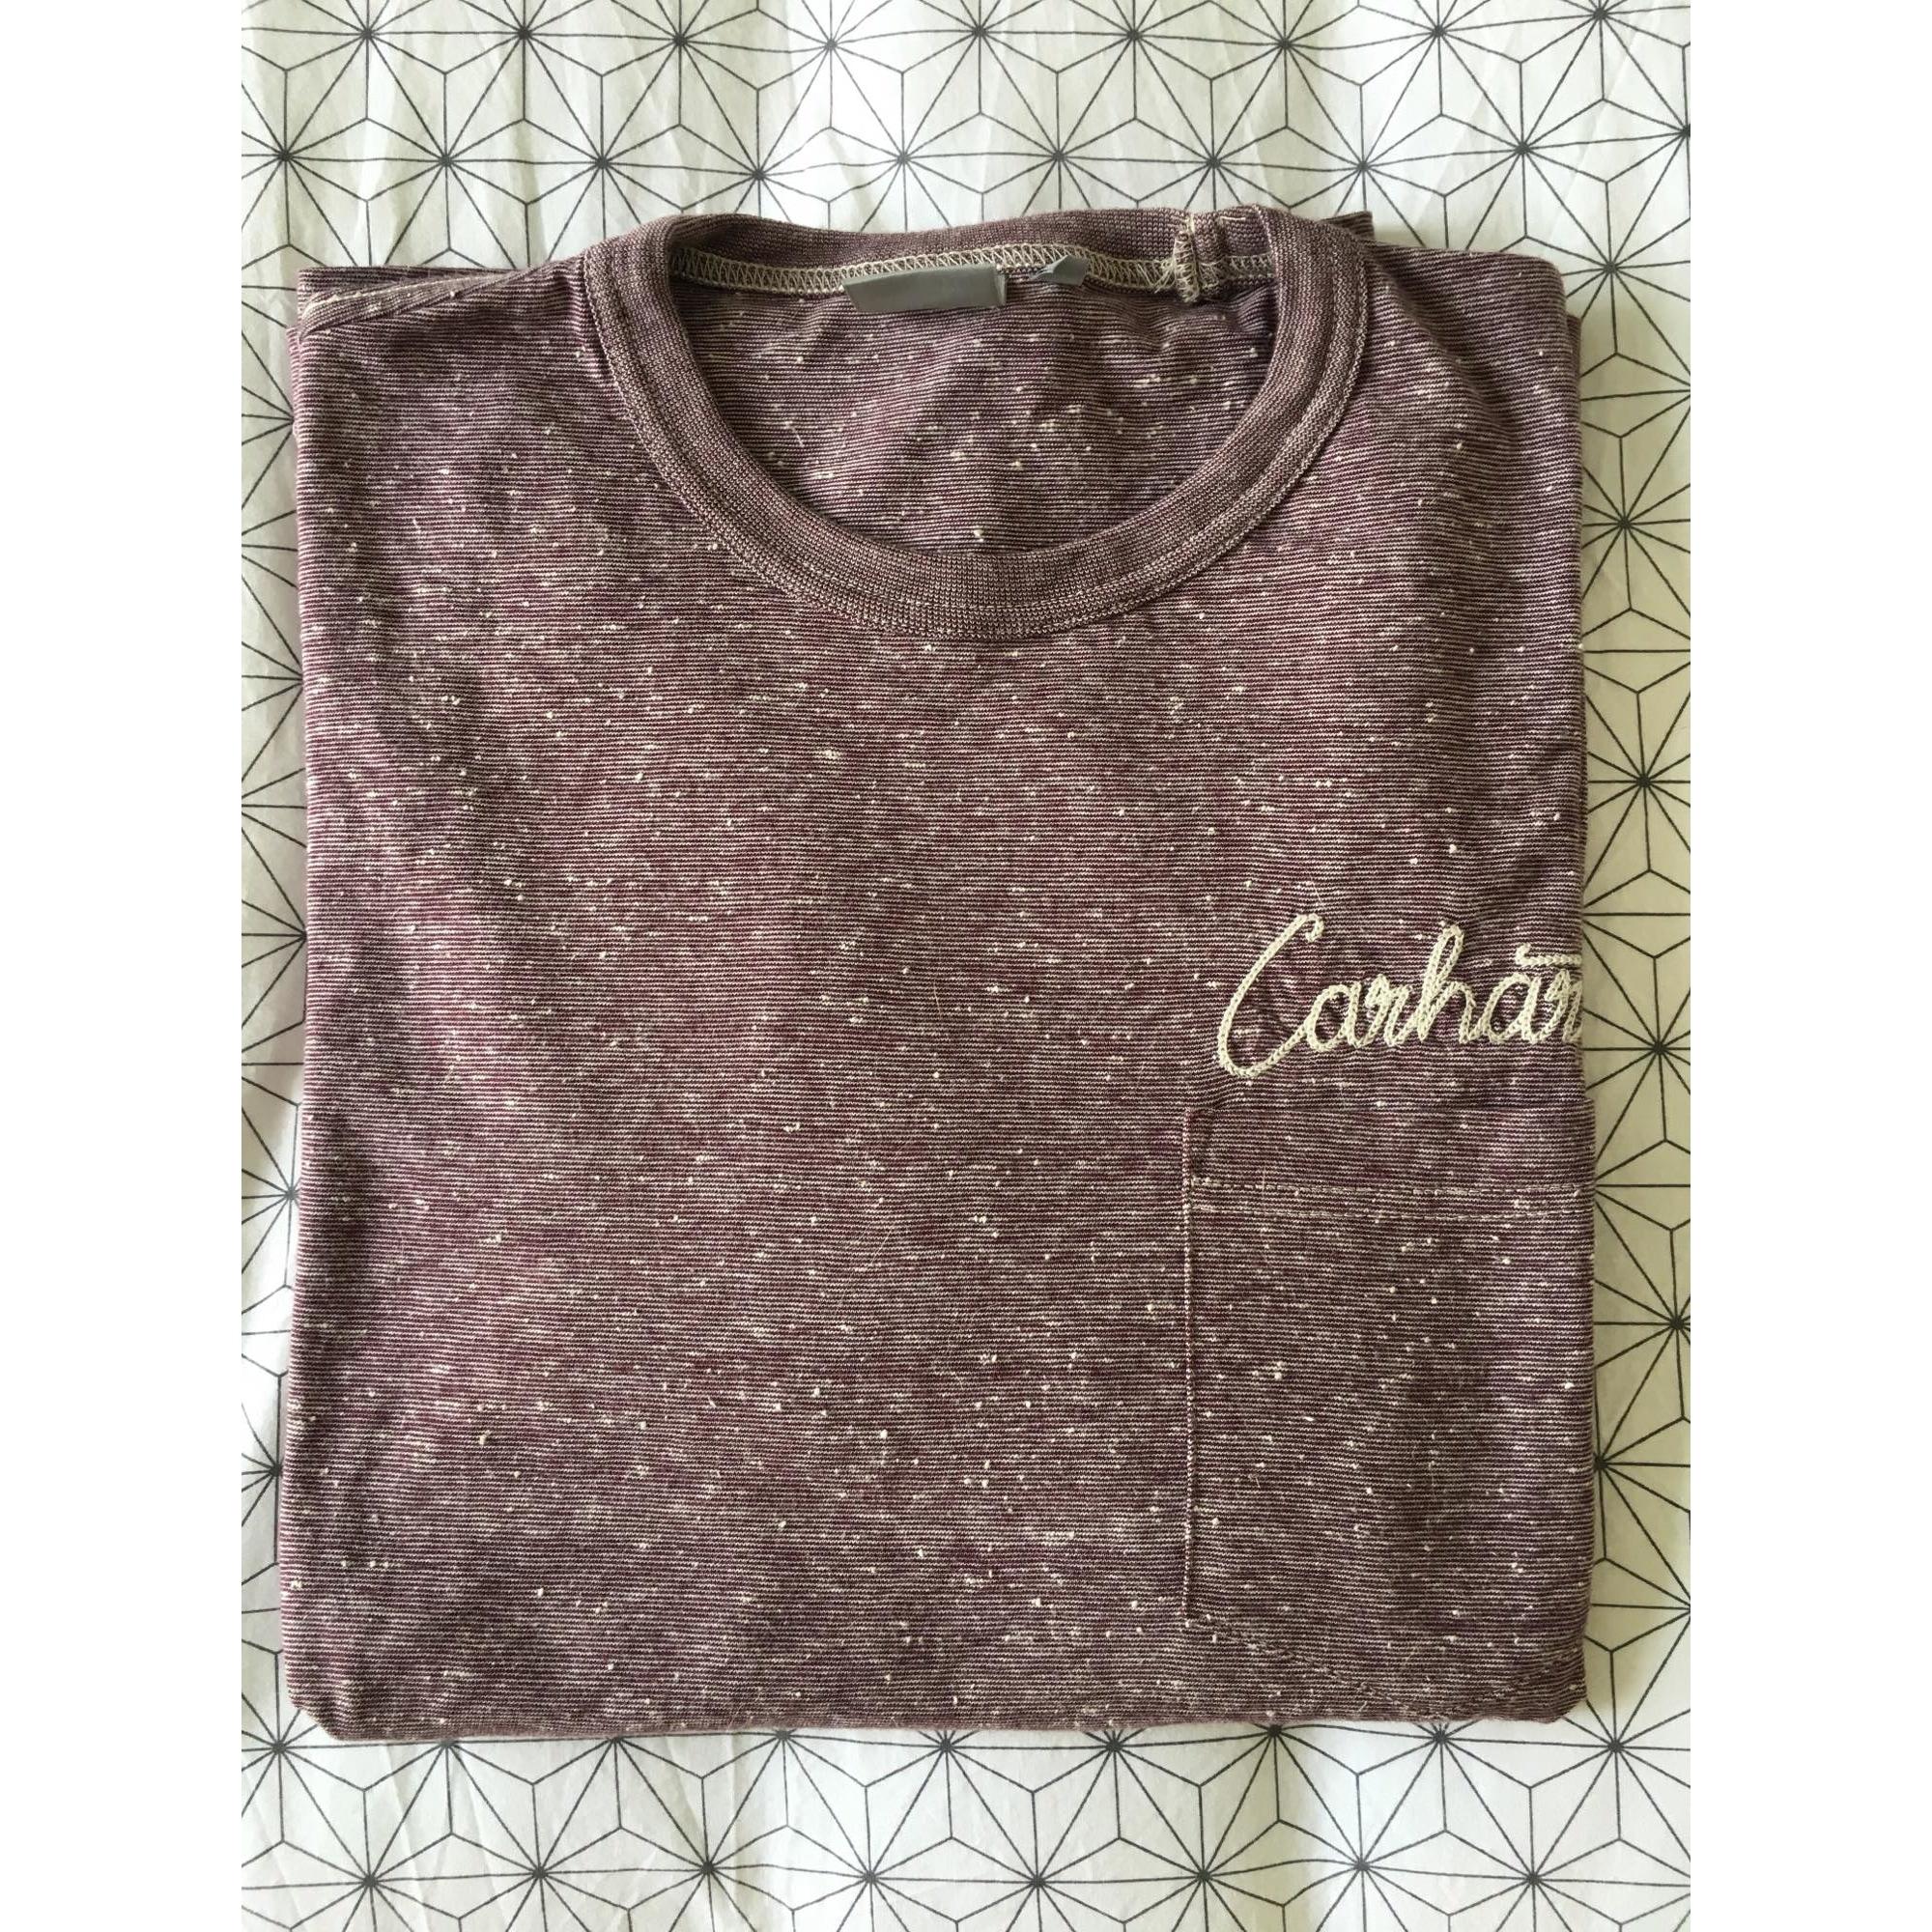 Tee-shirt CARHARTT Rouge, bordeaux